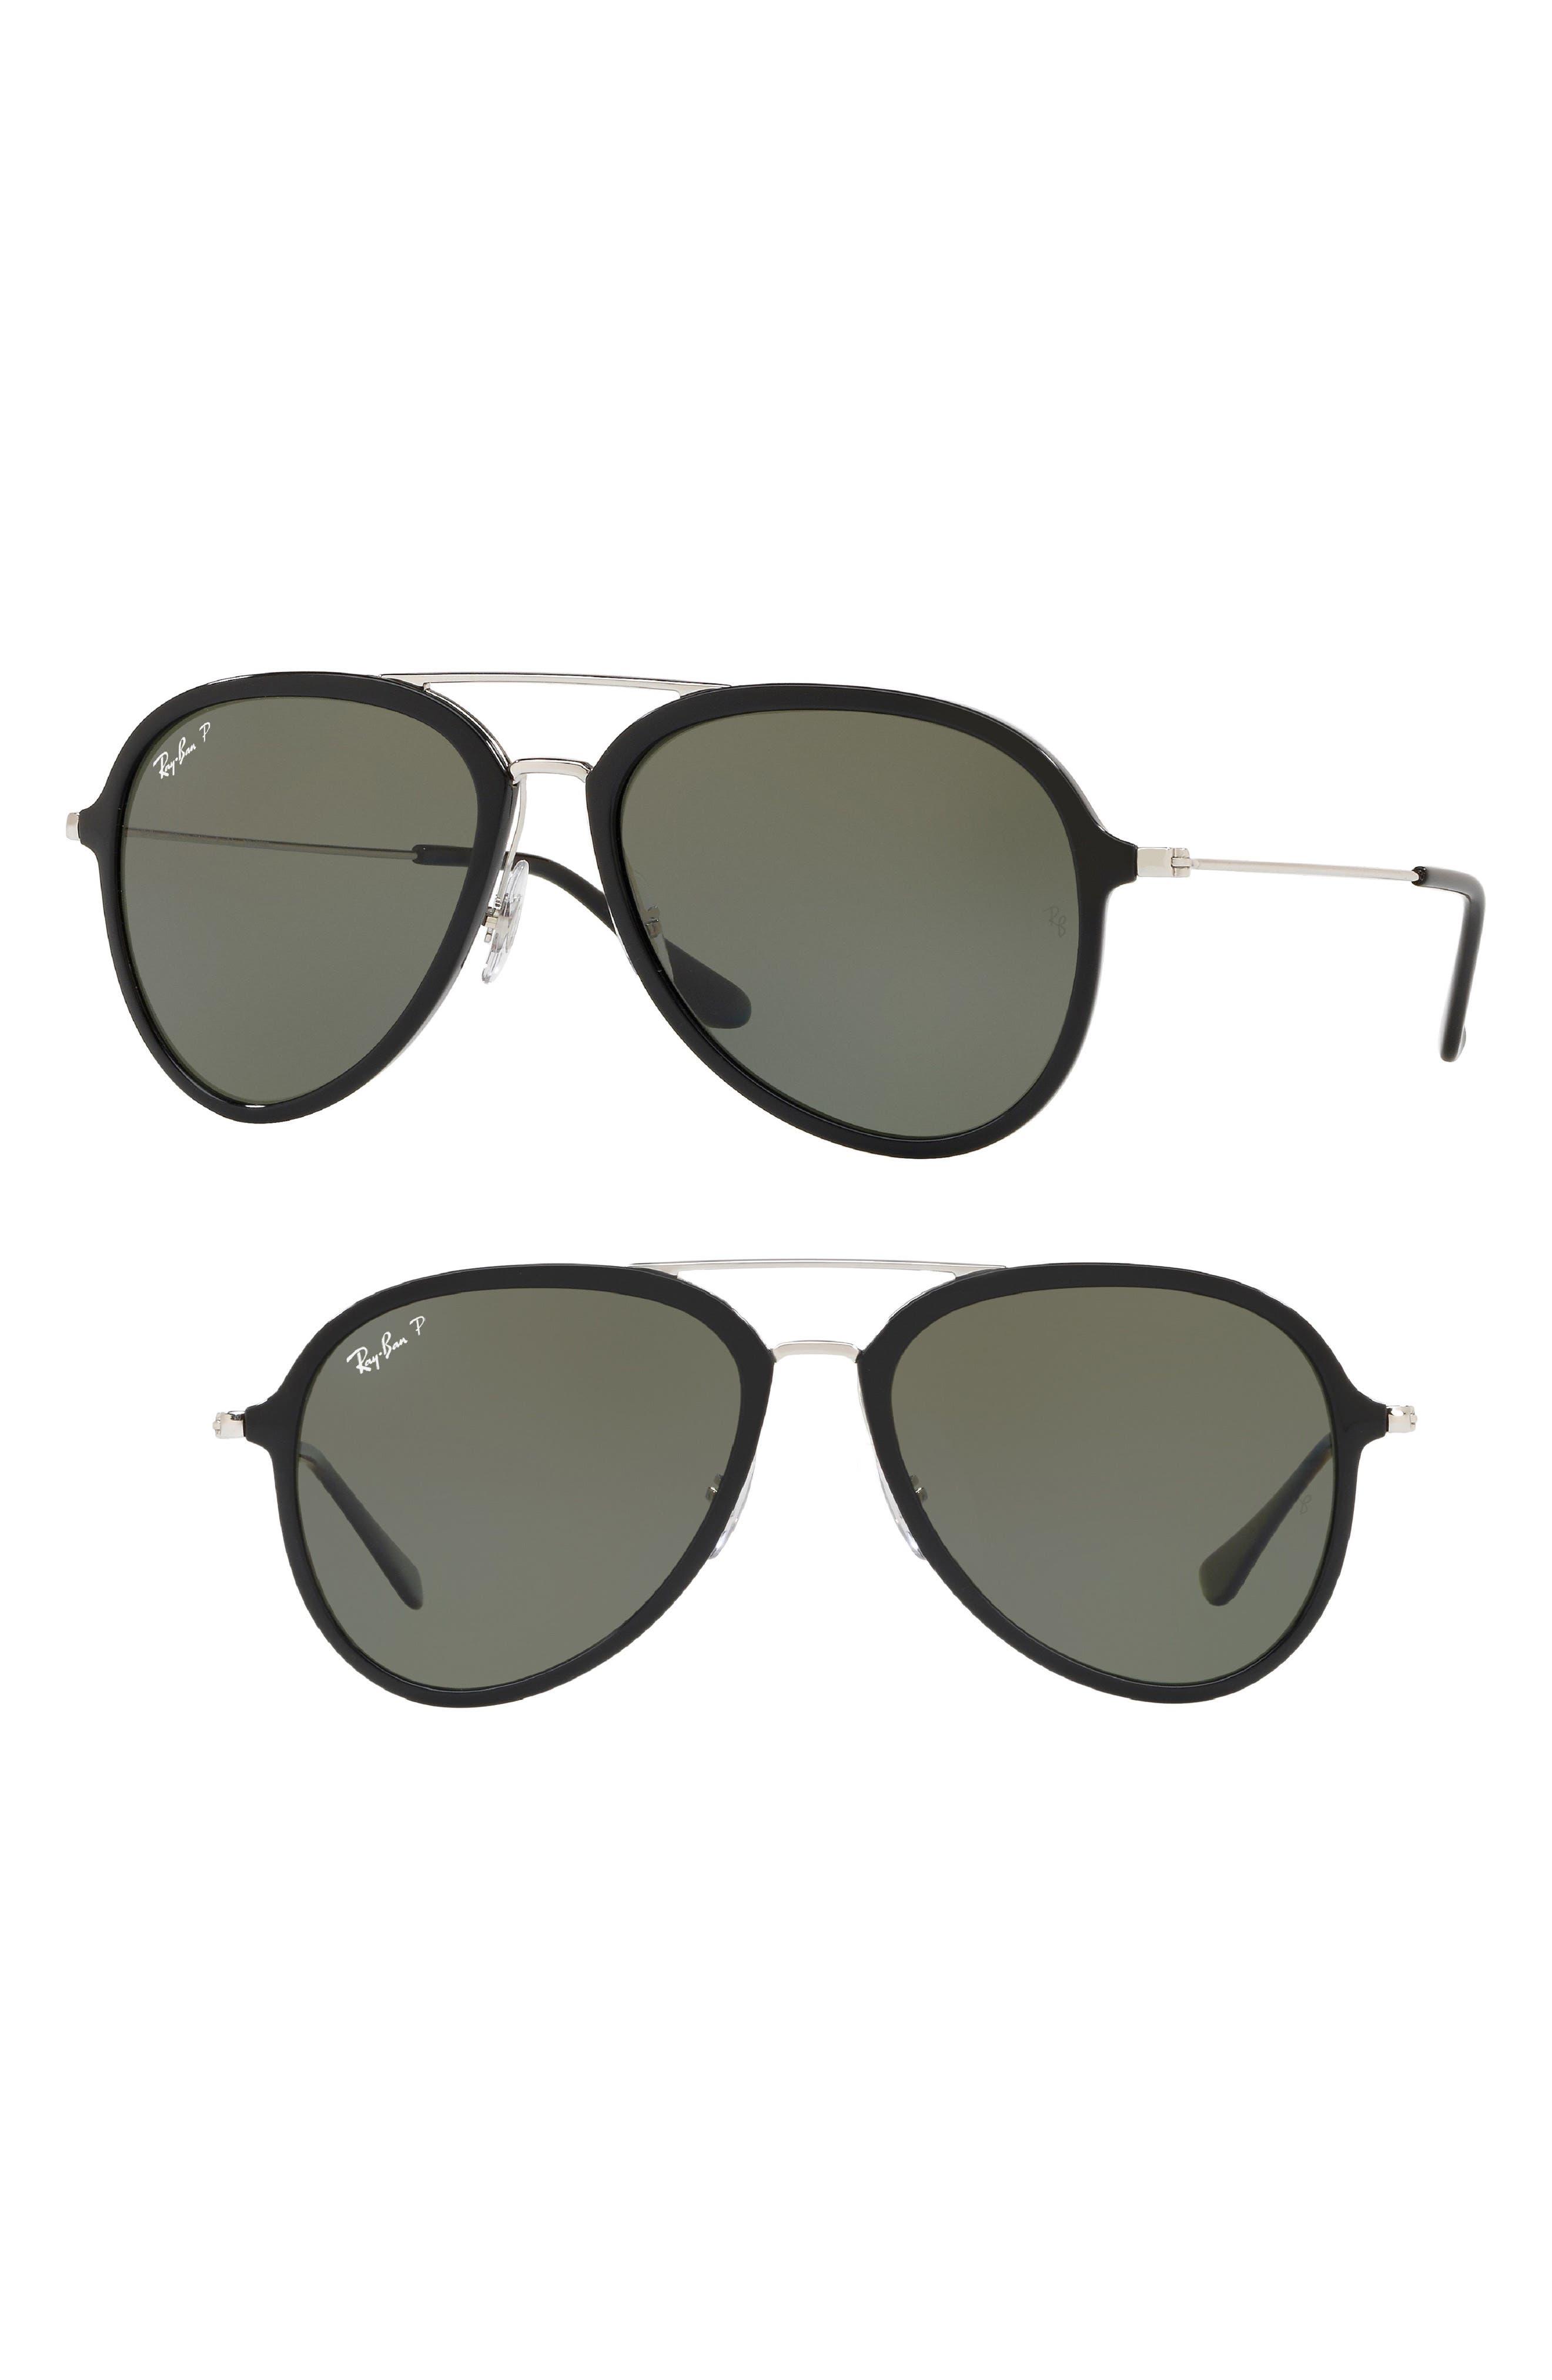 57mm Polarized Aviator Sunglasses,                             Main thumbnail 1, color,                             Black